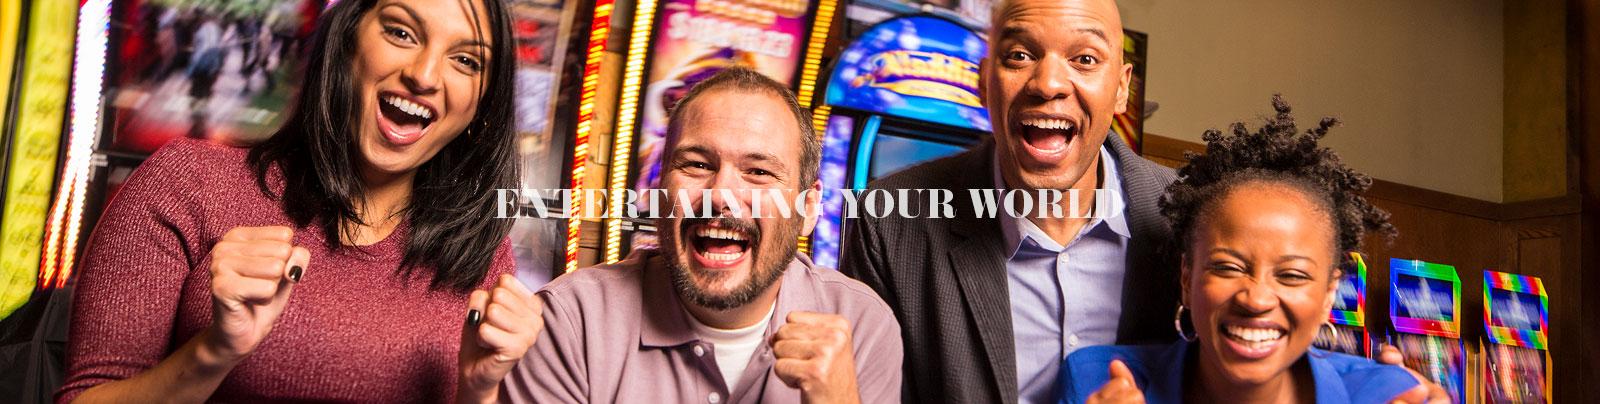 largest casino in blackhawk colorado